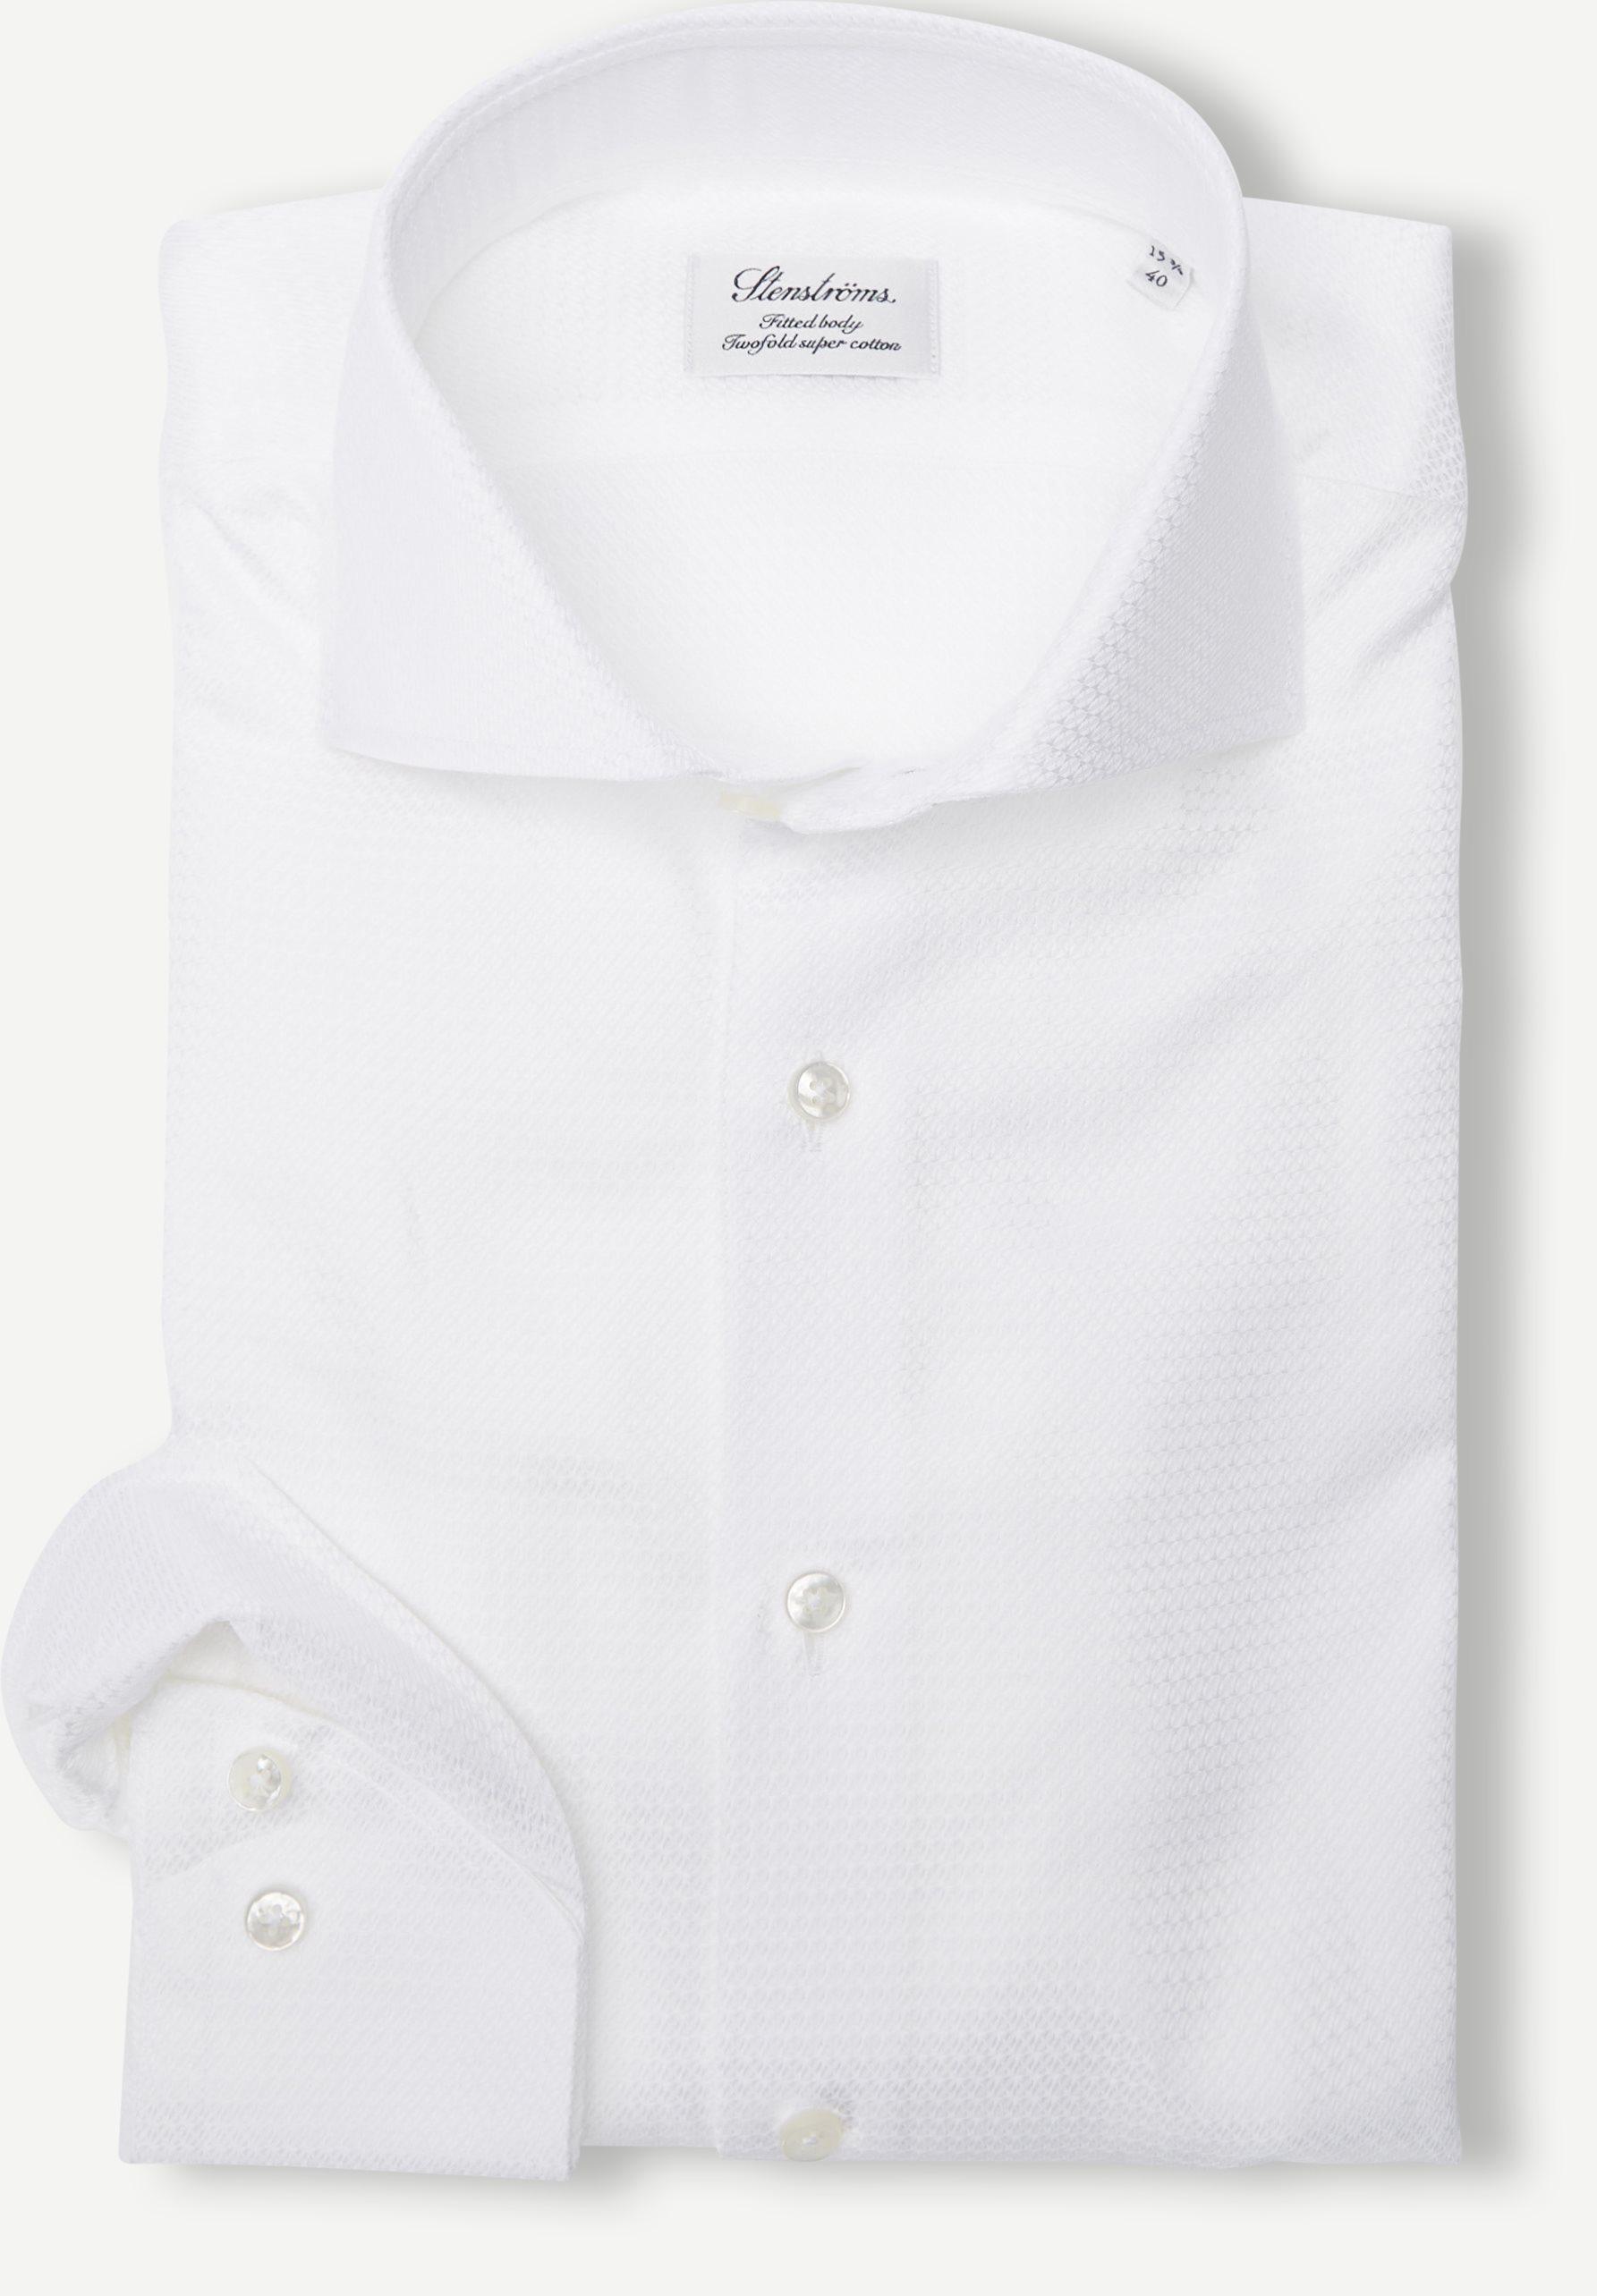 8100 702111 Shirt - Skjorter - Slim fit - Hvid